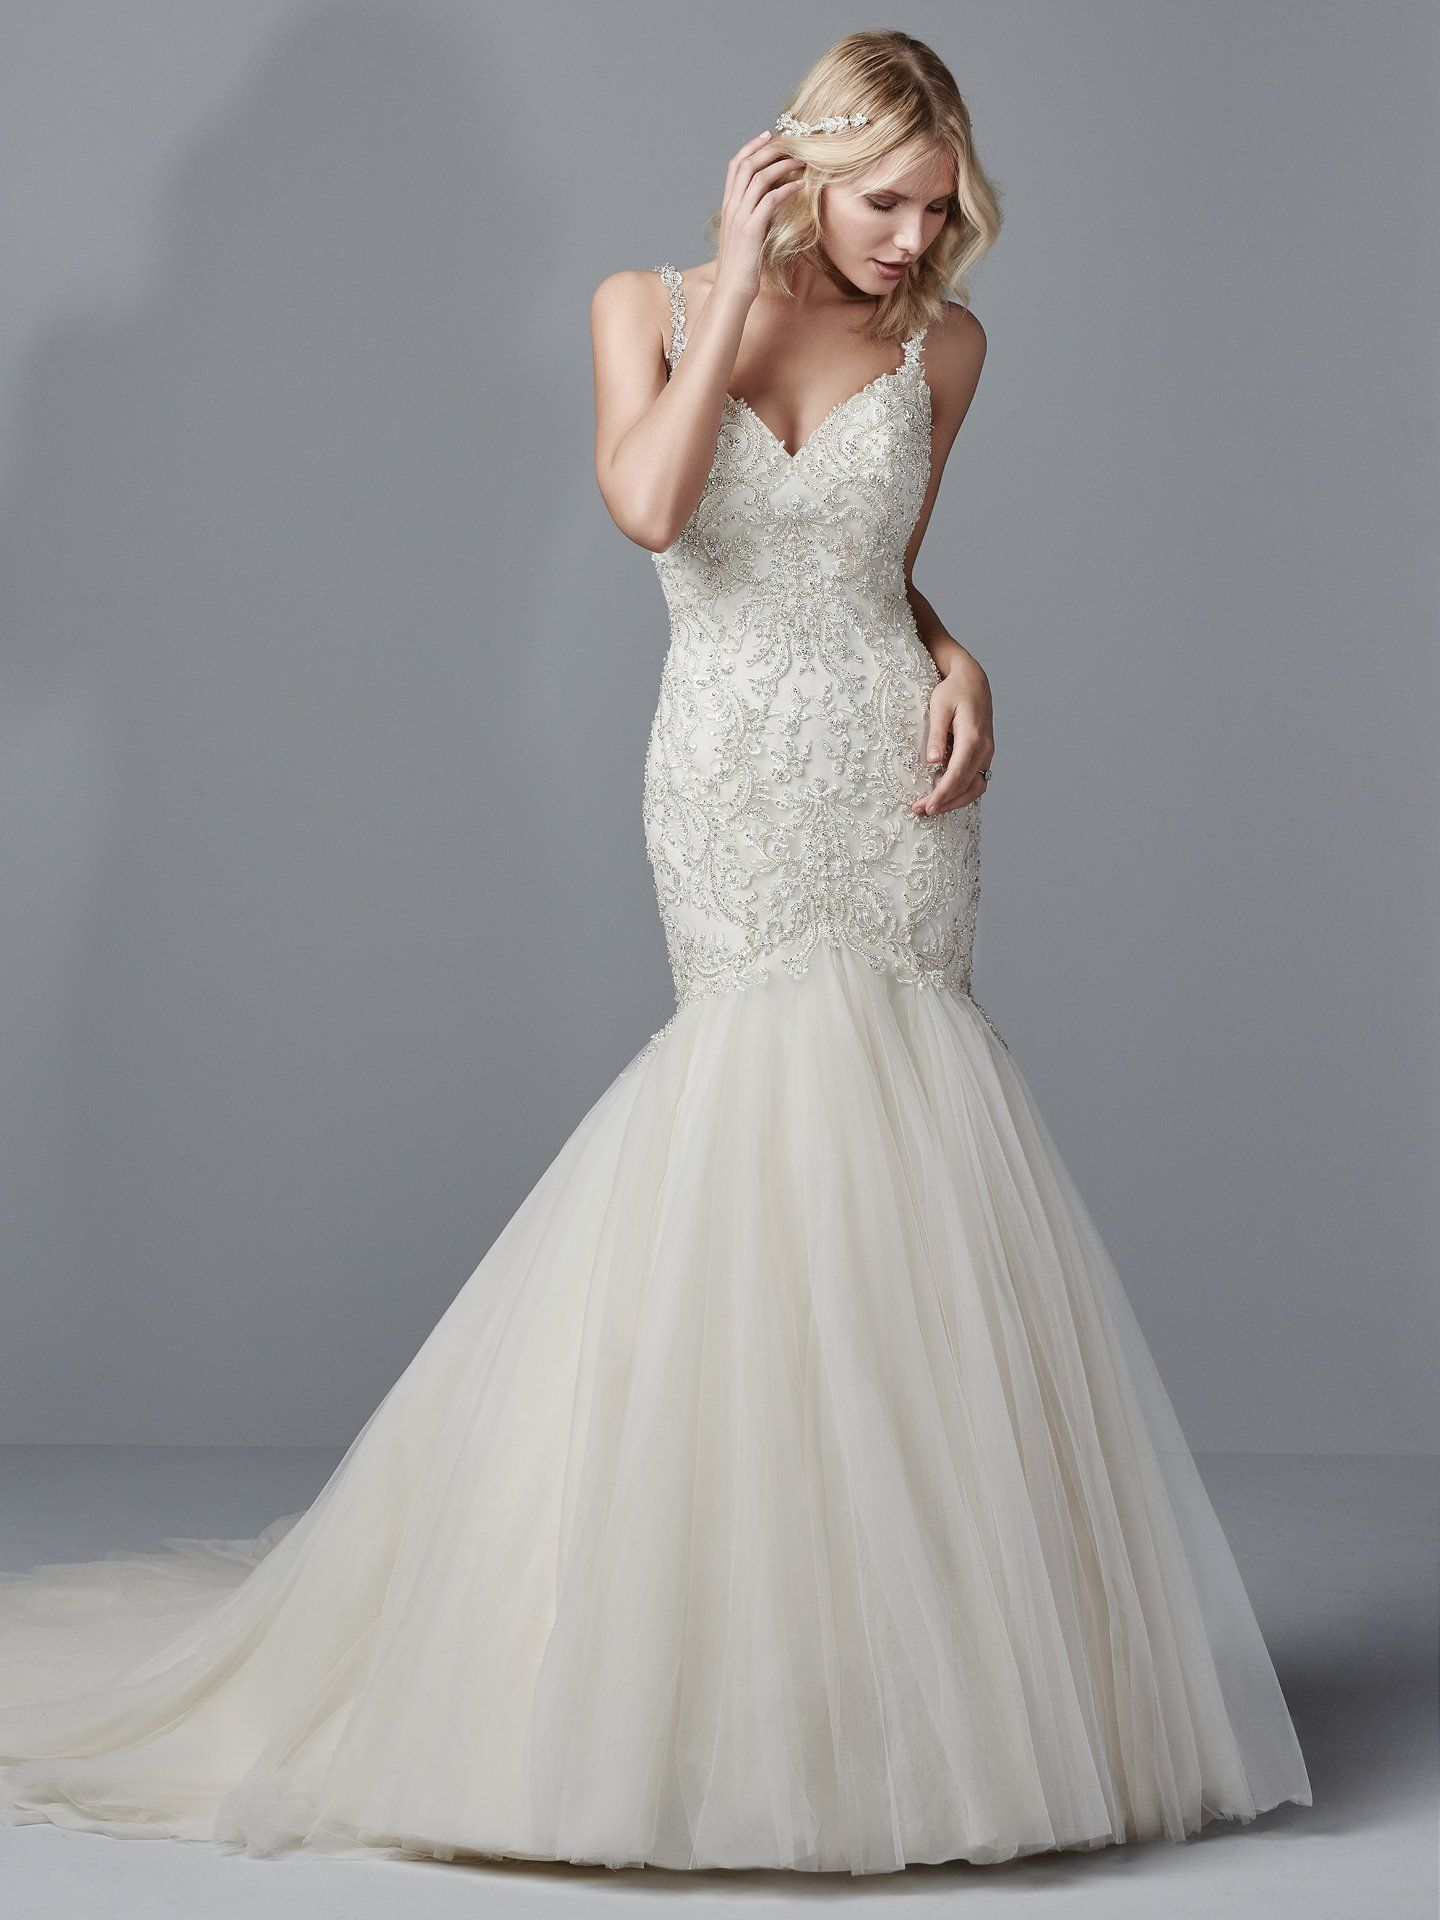 Maggie sottero wedding dresses sottero midgley and wedding dress